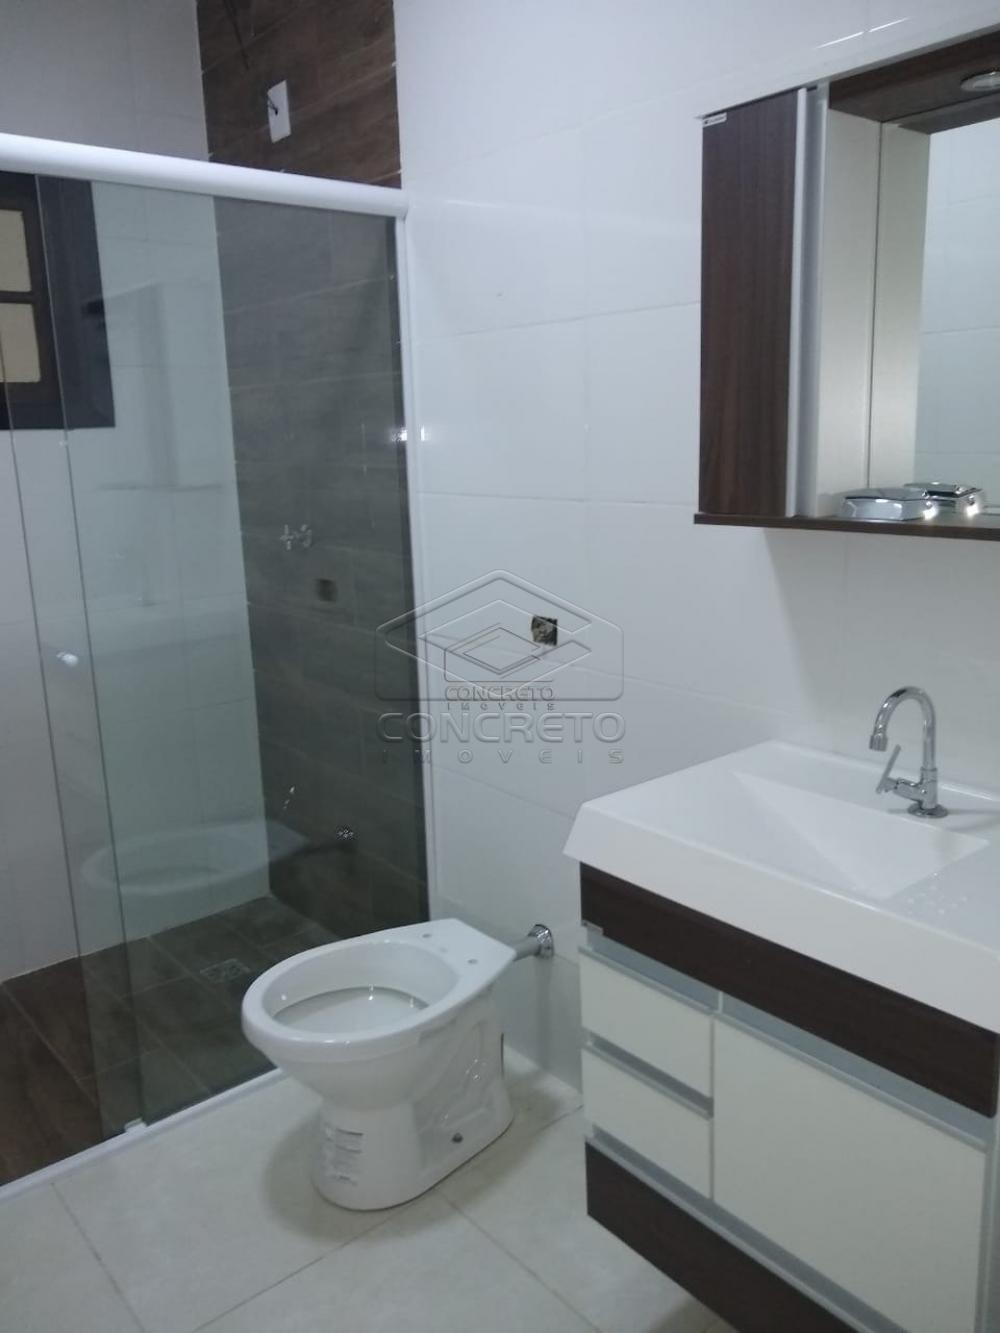 Comprar Casa / Condomínio em Bauru R$ 280.000,00 - Foto 5